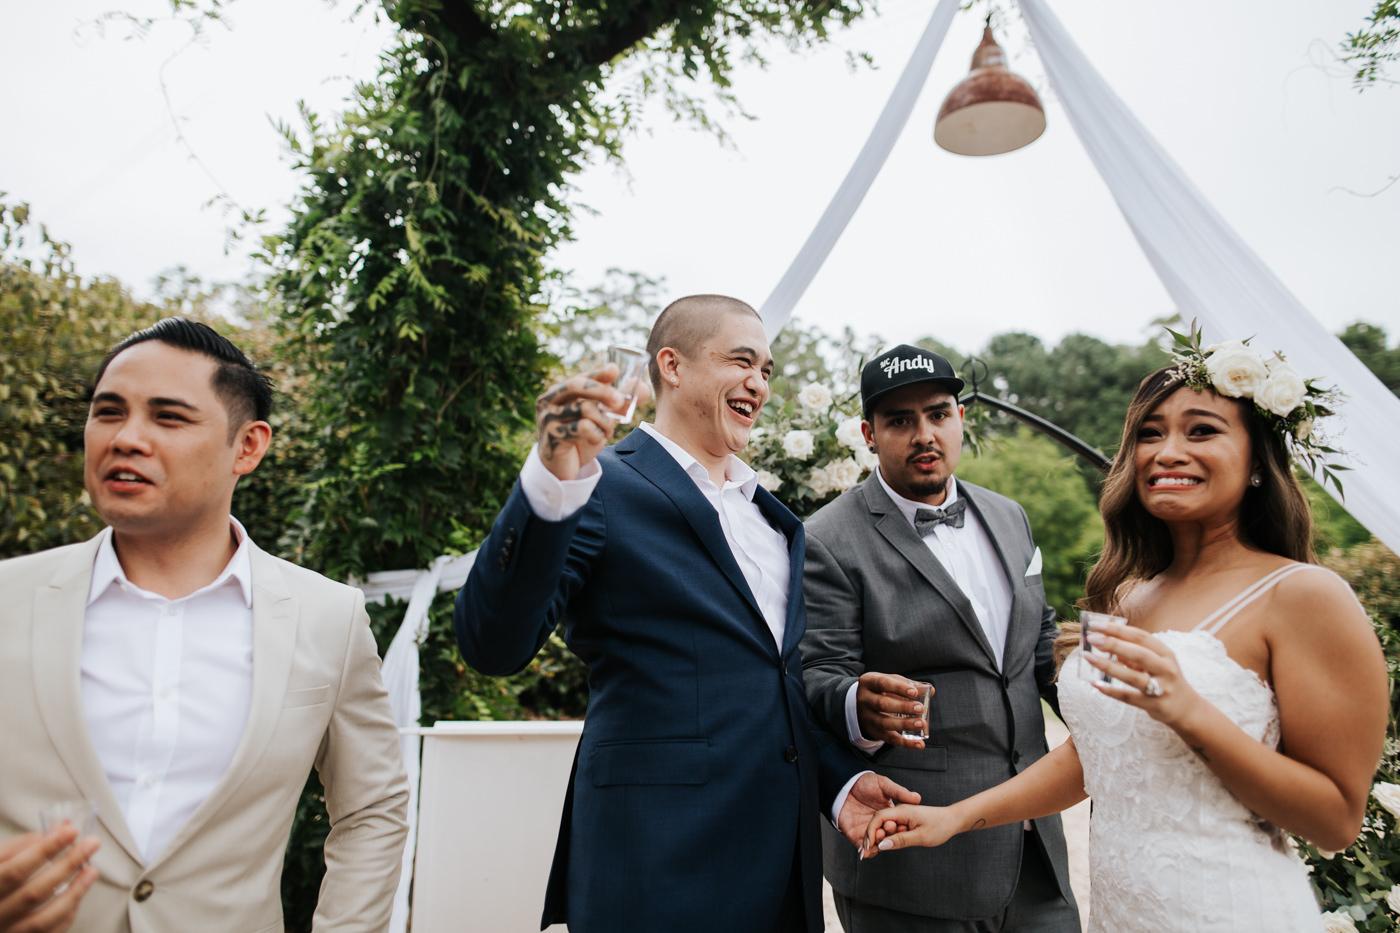 Nick & Vanezza - Fernbank Farm Wedding - Samantha Heather Photography-80.jpg